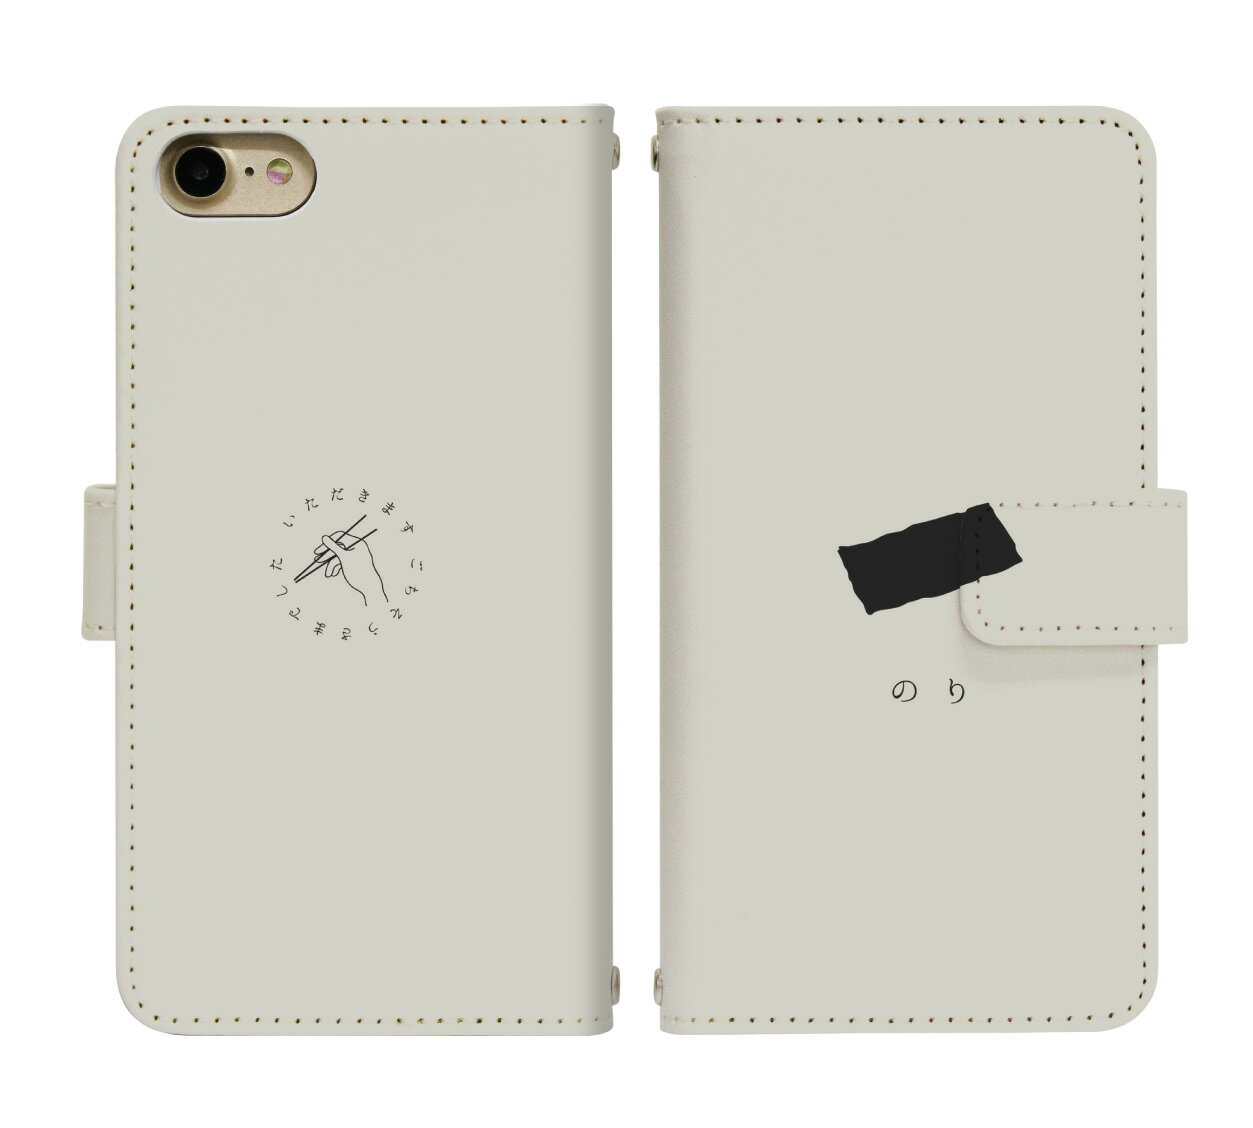 iPhone 6s Plus ベルト有り 手帳型 スマホケース スマホカバー アイフォン6sプラス アイフォンシックスsプラス スマートフォン スマートホン 携帯 ケース アイホン6sプラス アイホンシックスsプラス di553